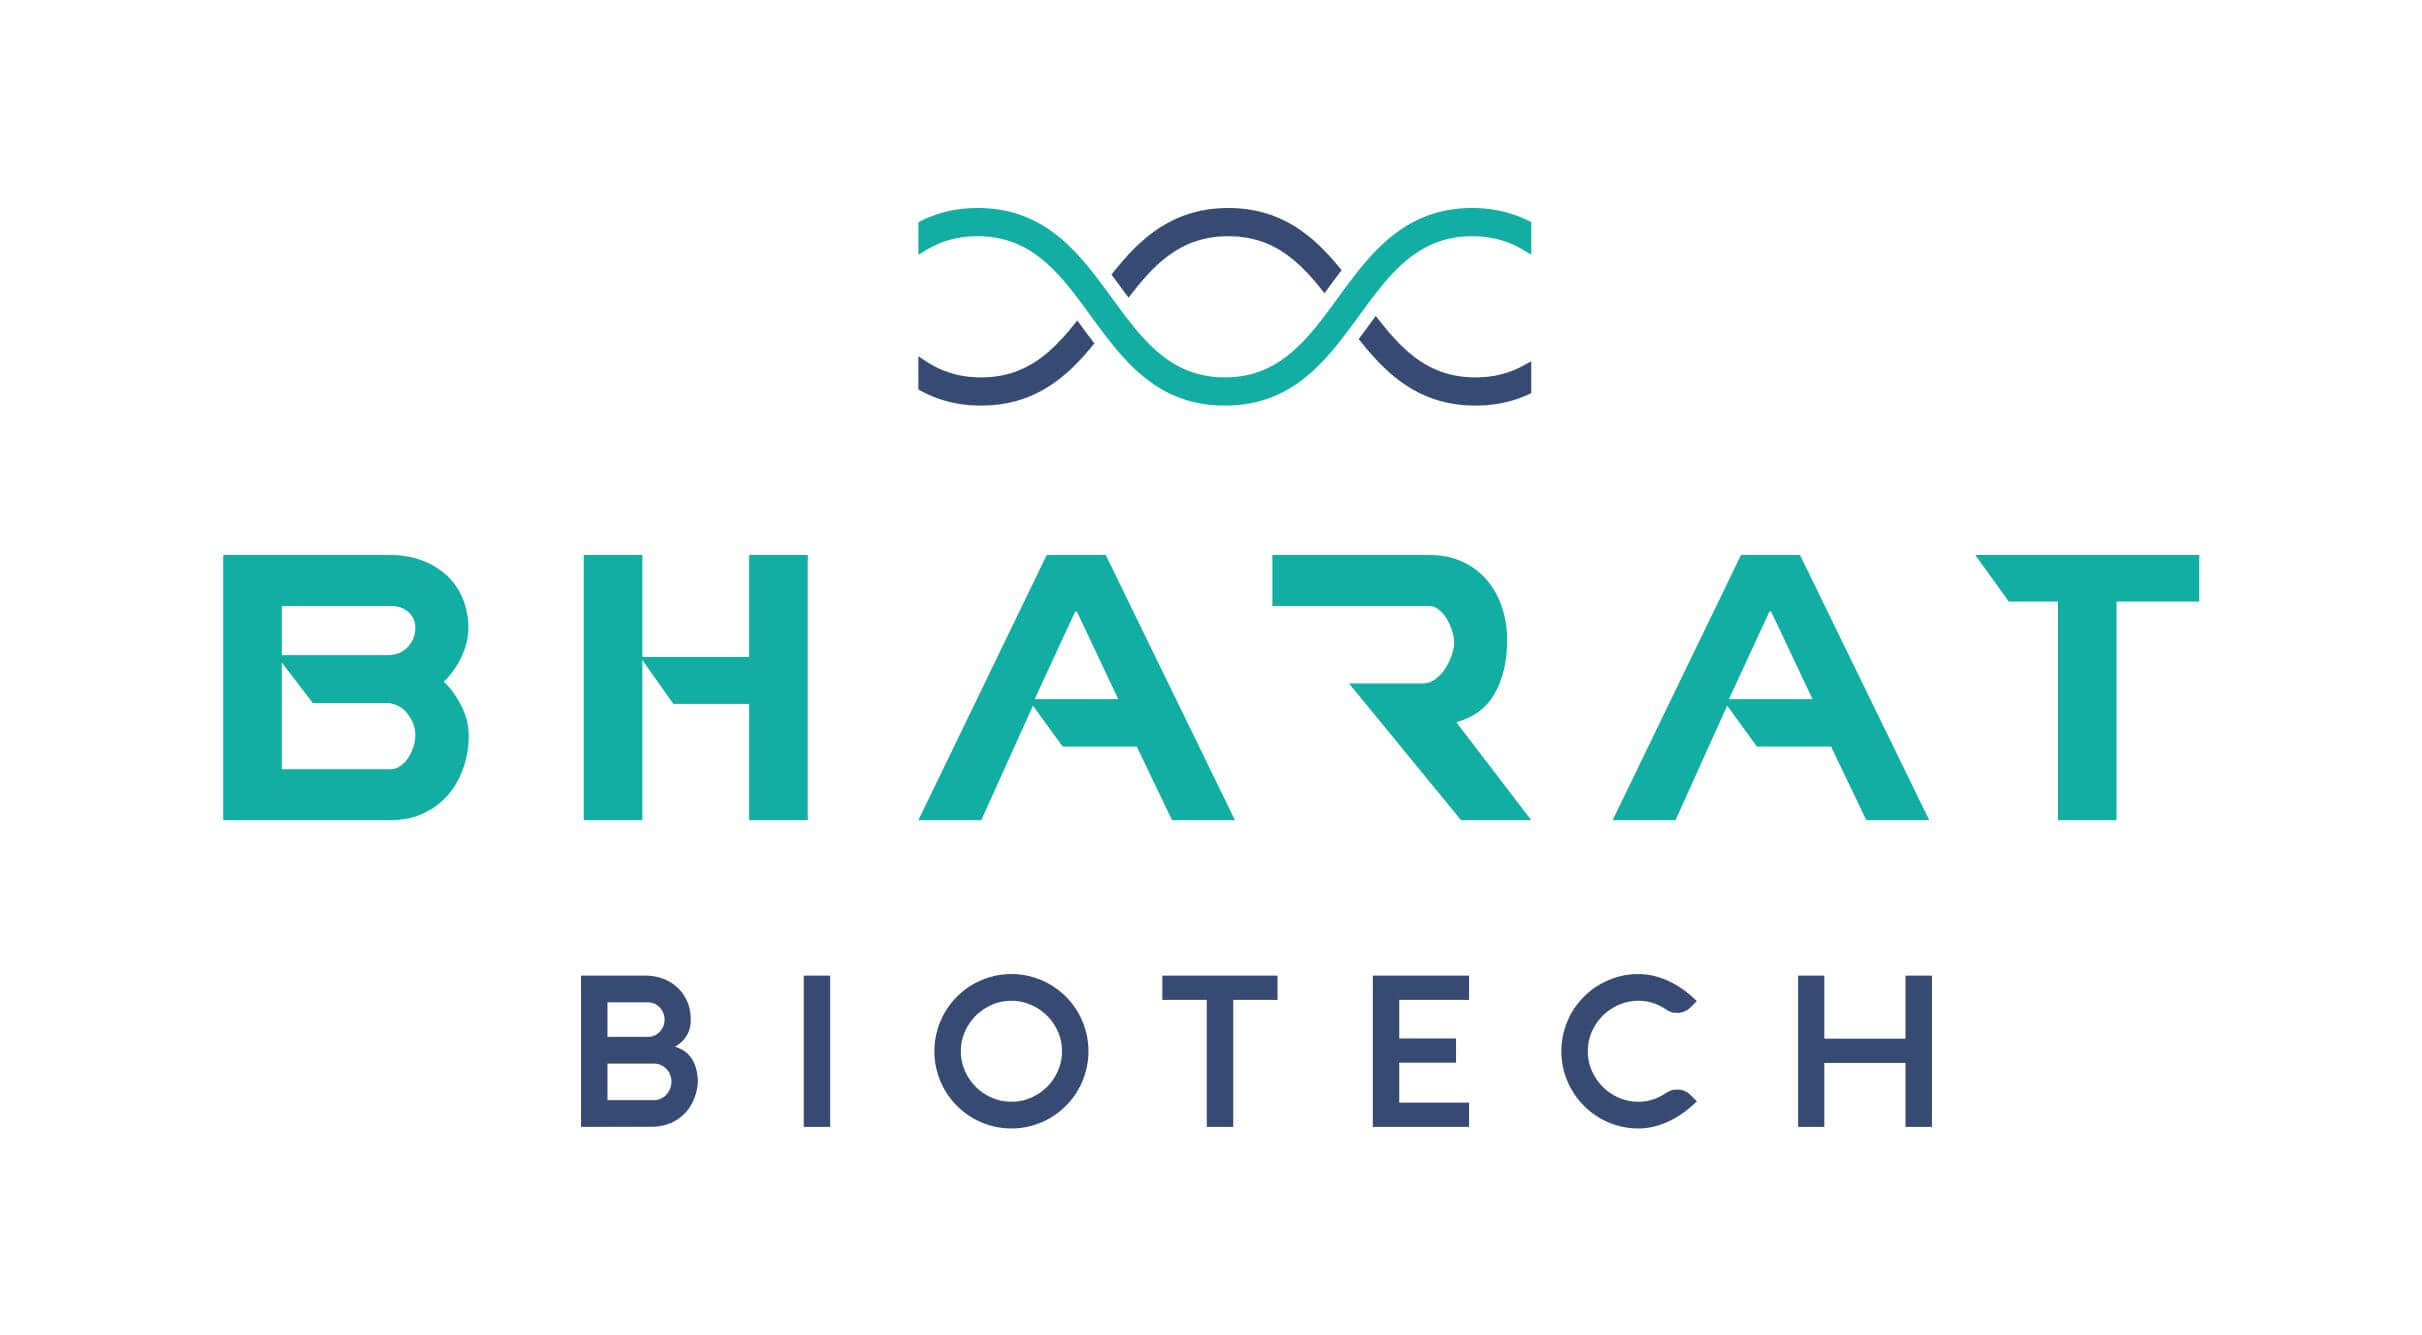 bharatbiotechannouncesitsagreementtosupplycovaxintobrazil